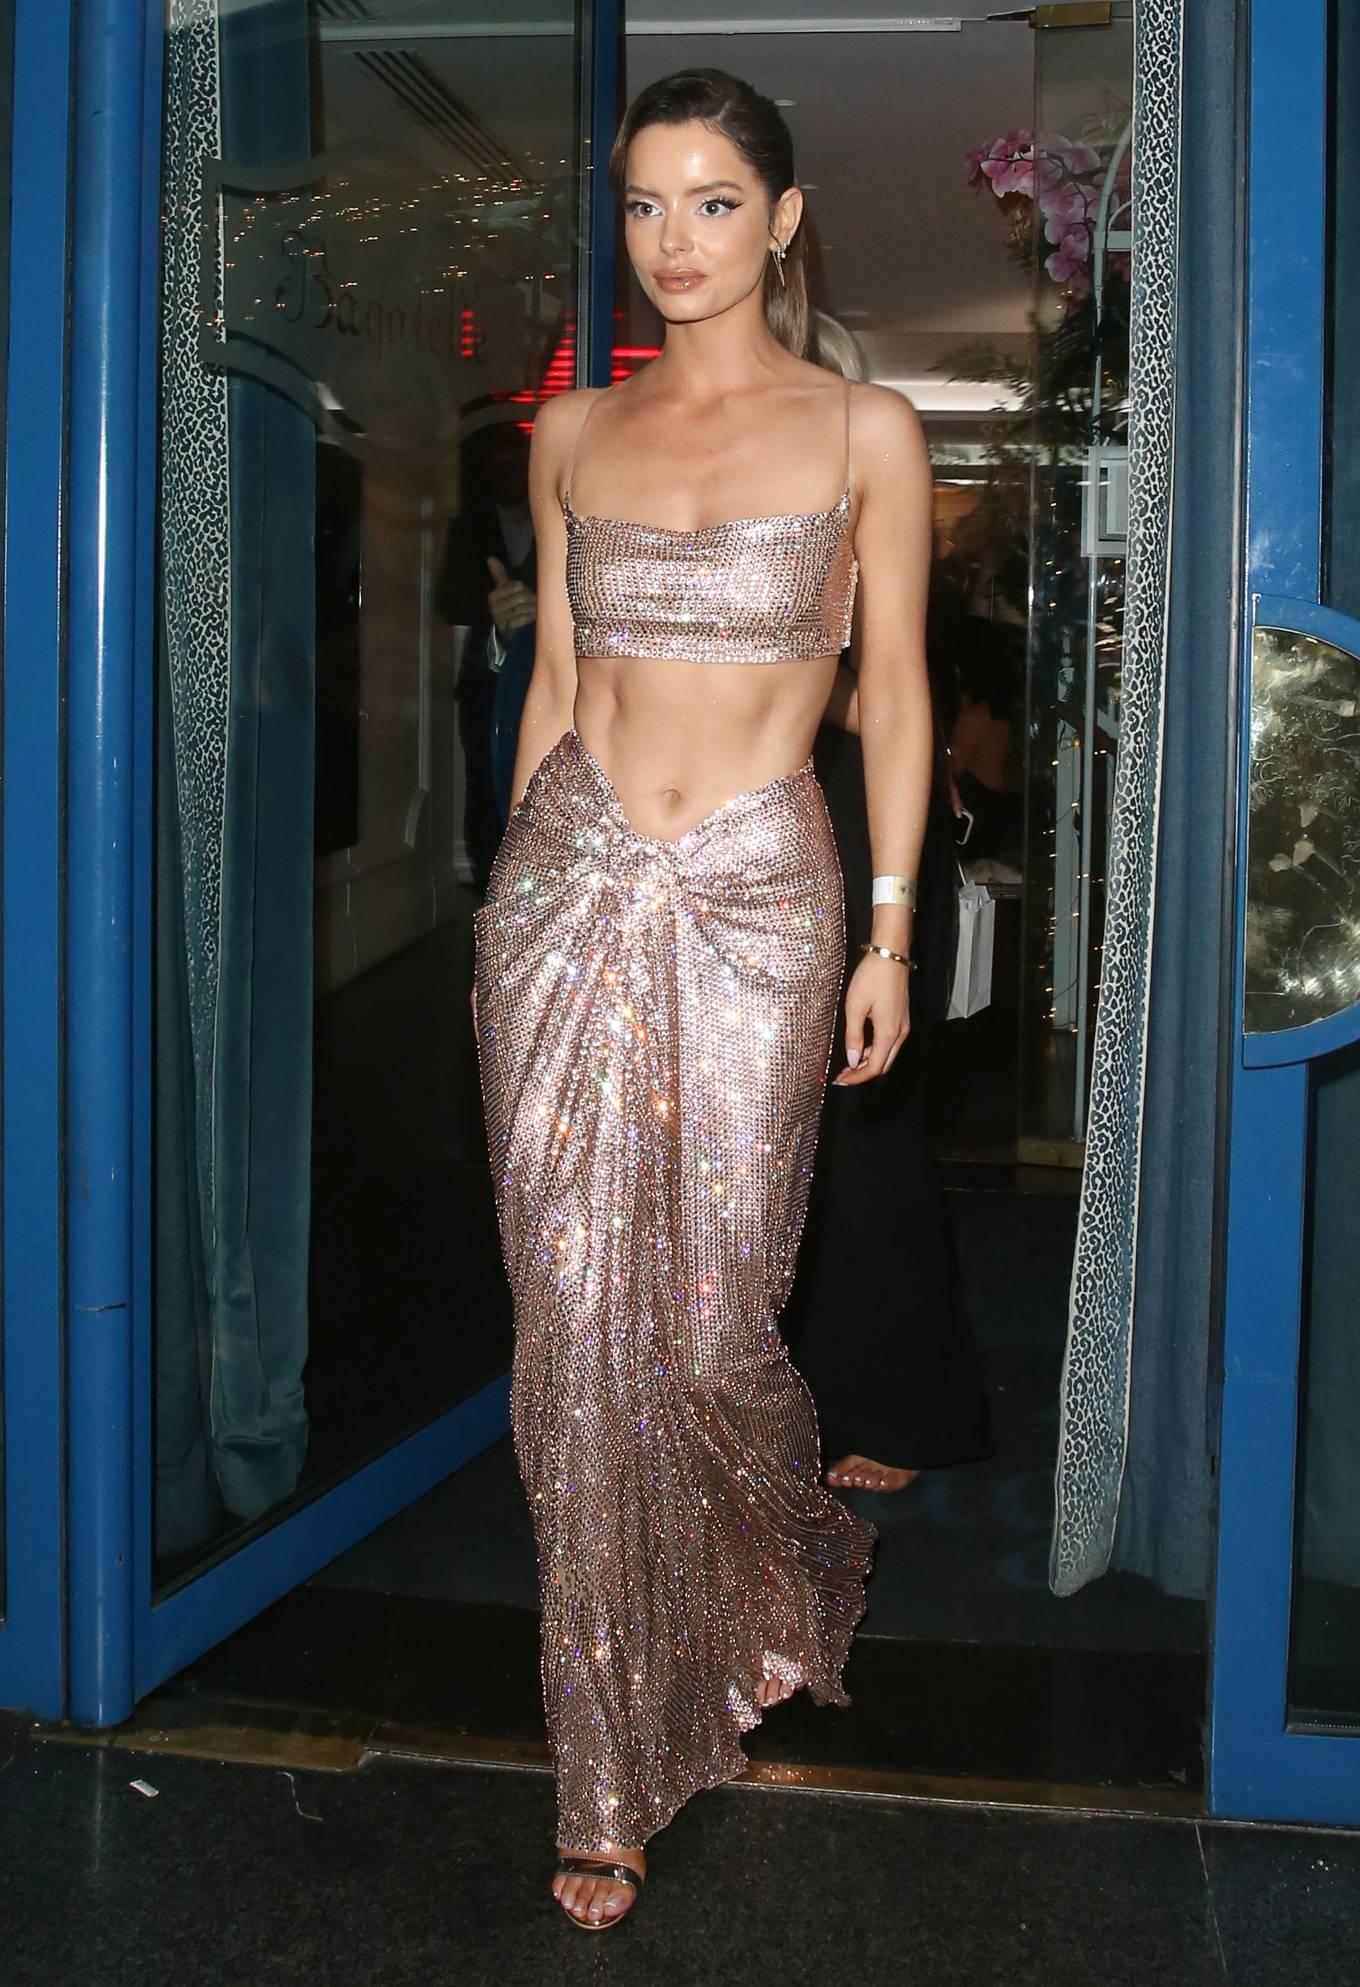 Maura Higgins - Seen at 26th National Television Awards in London